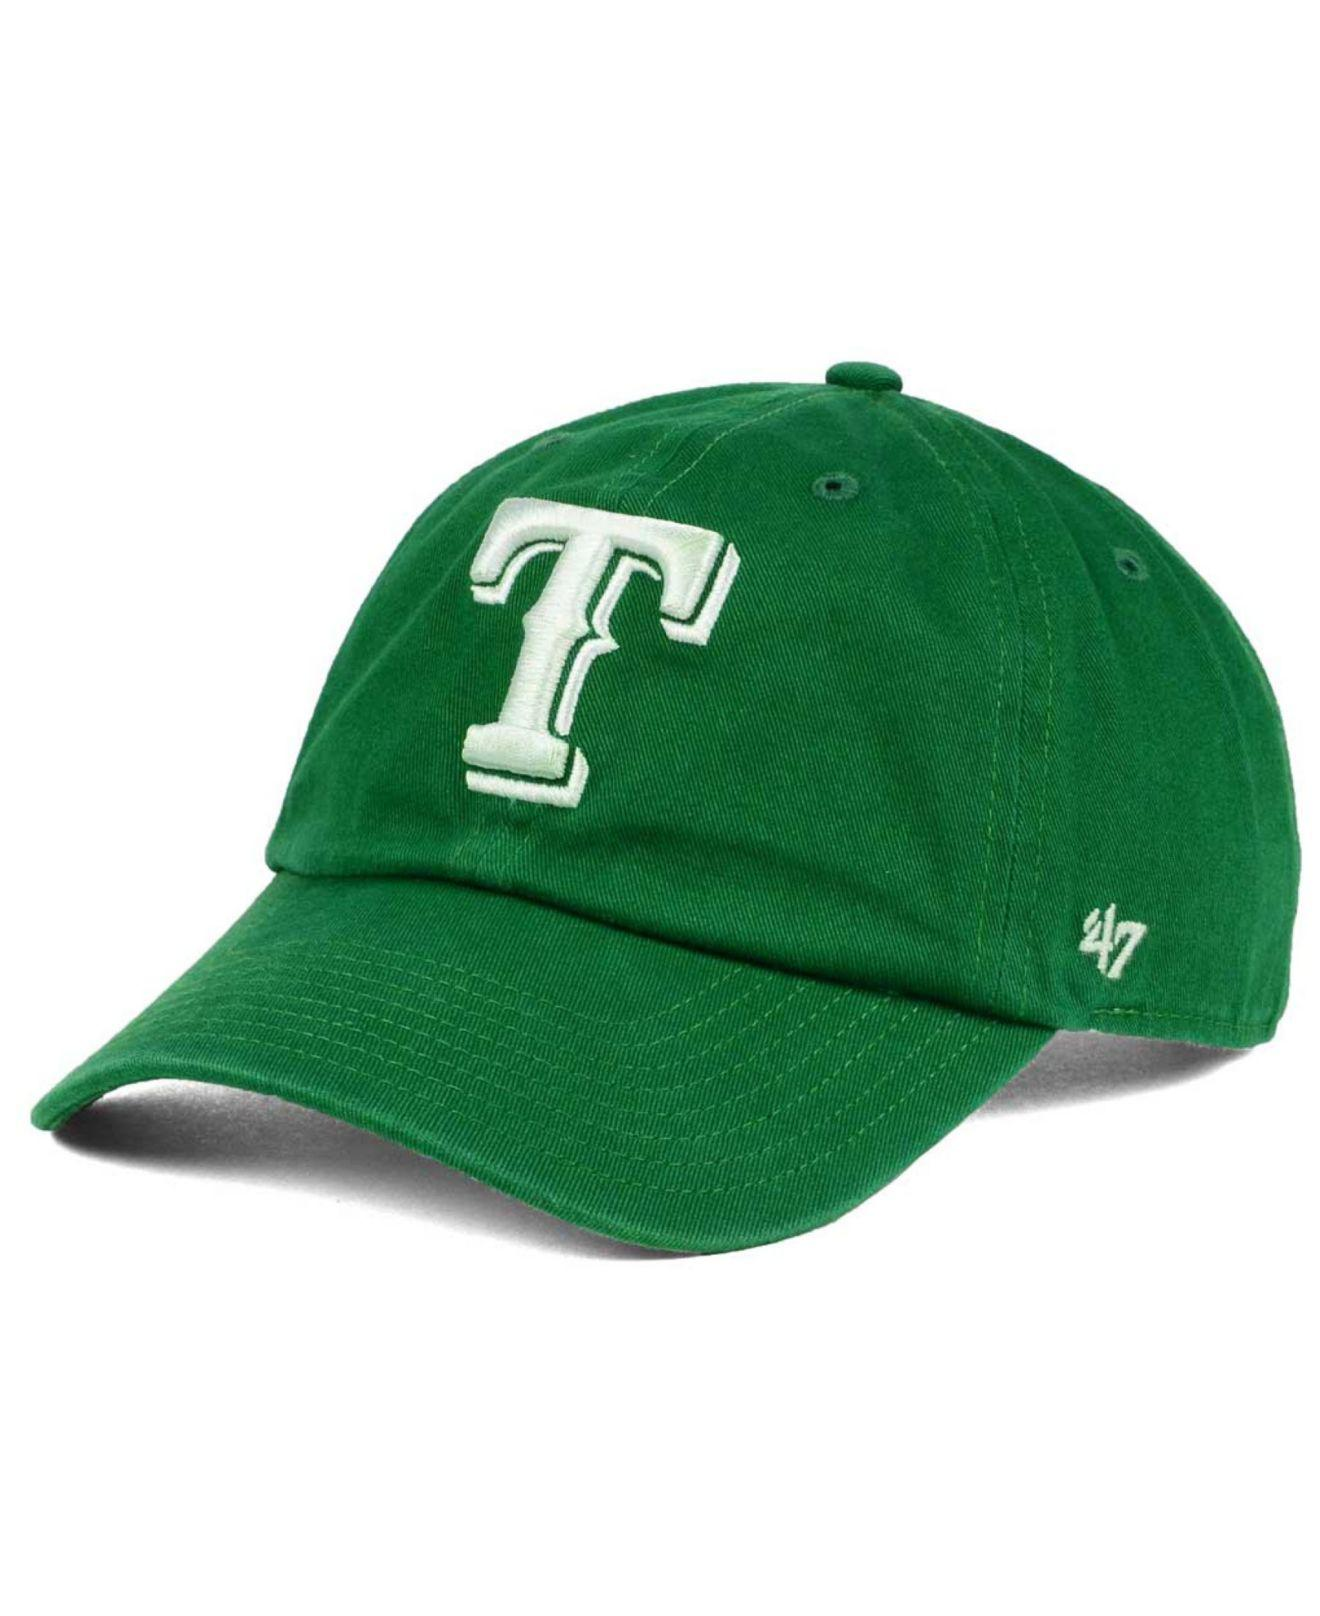 0635c3d0217e7 ... discount code for 47 brand. mens green texas rangers kelly white clean  up cap 238b2 sale texas longhorns ...